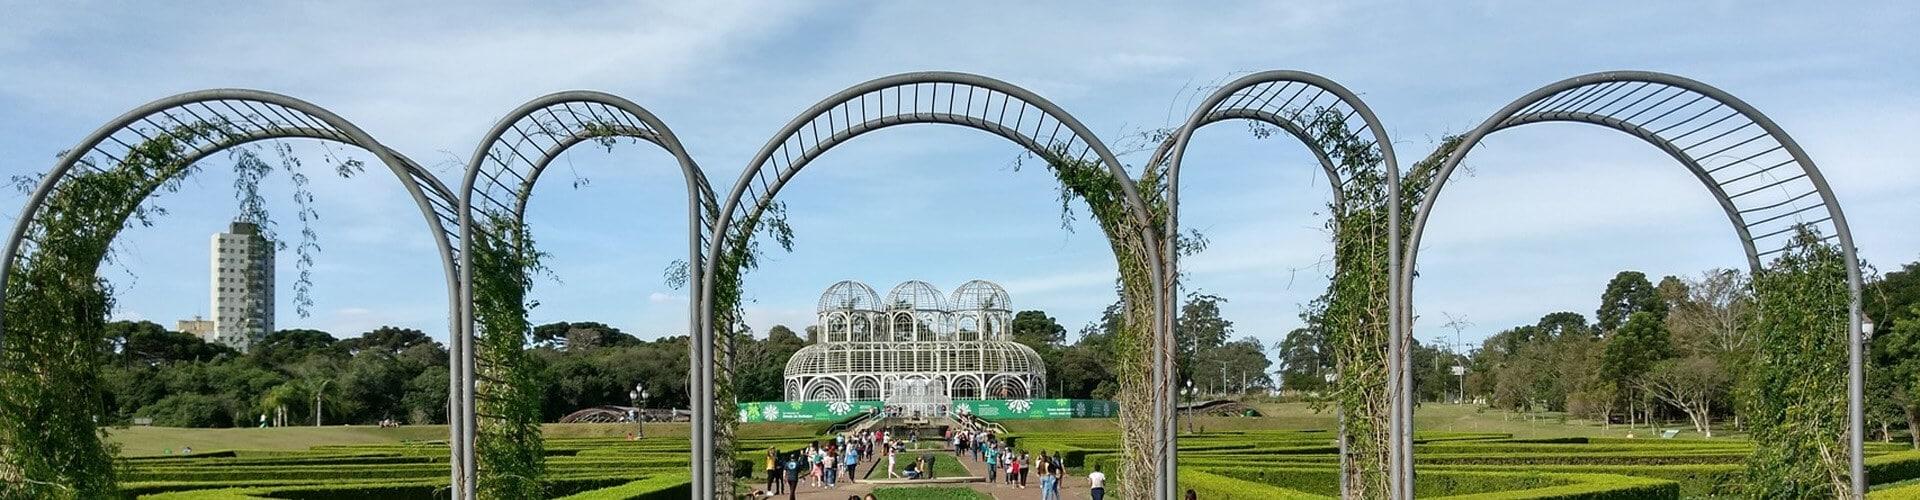 Curitiba, Brazil: The City of Recycling